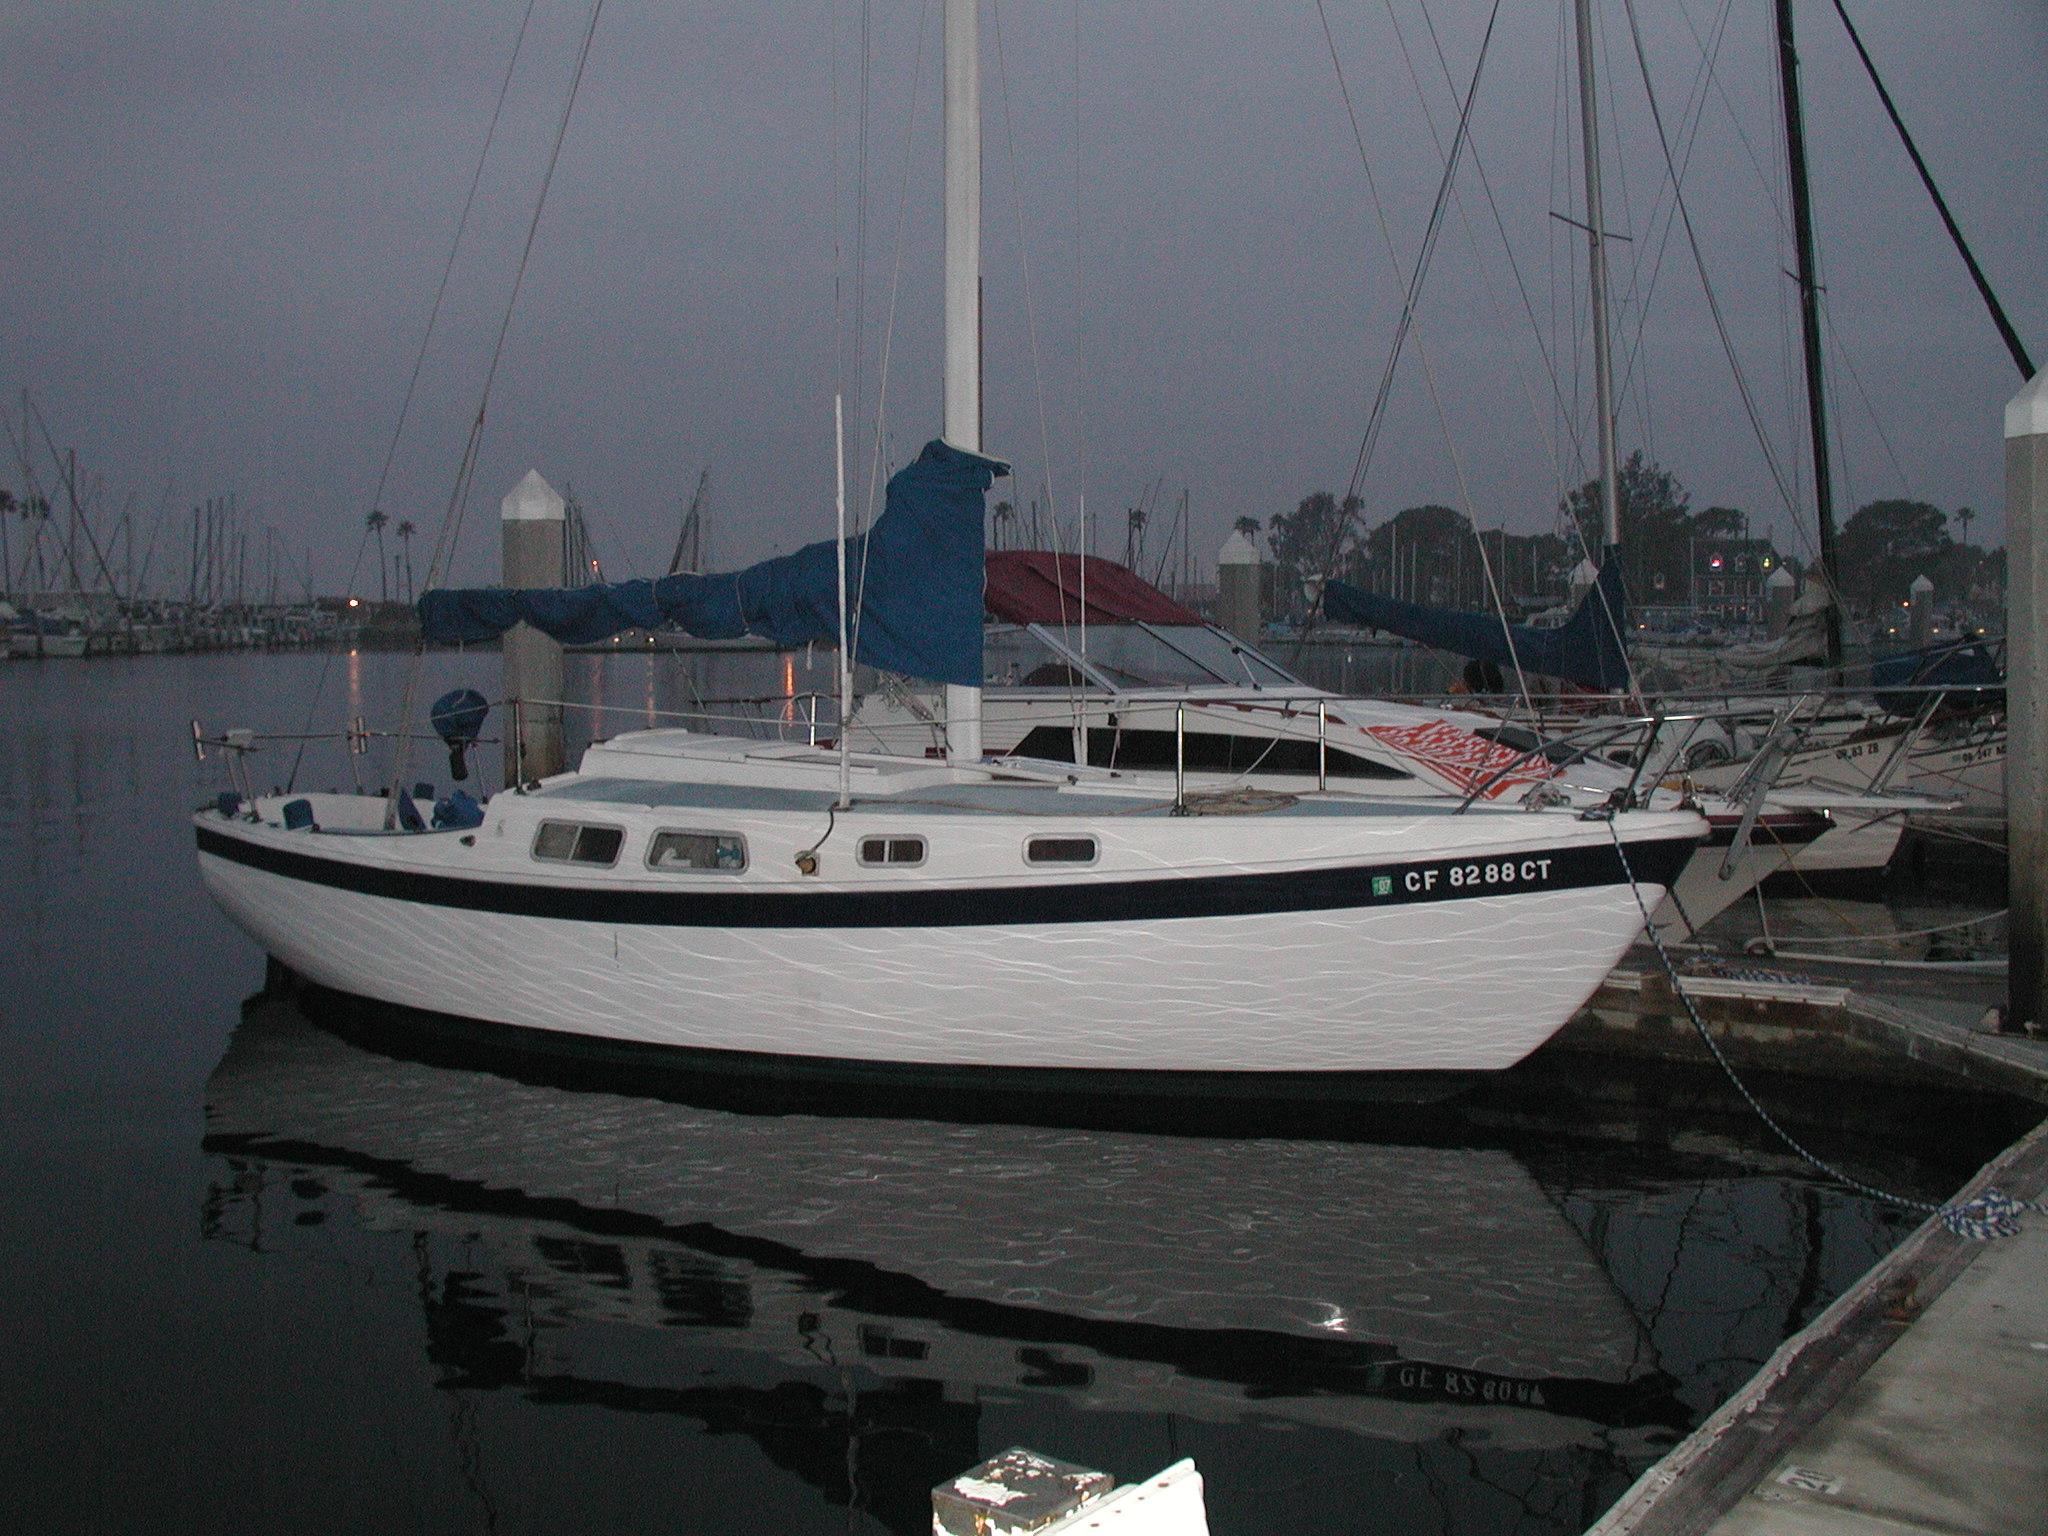 Cal 28 Sailboat 1965 Gangfurd The Boat Bill Lathrop